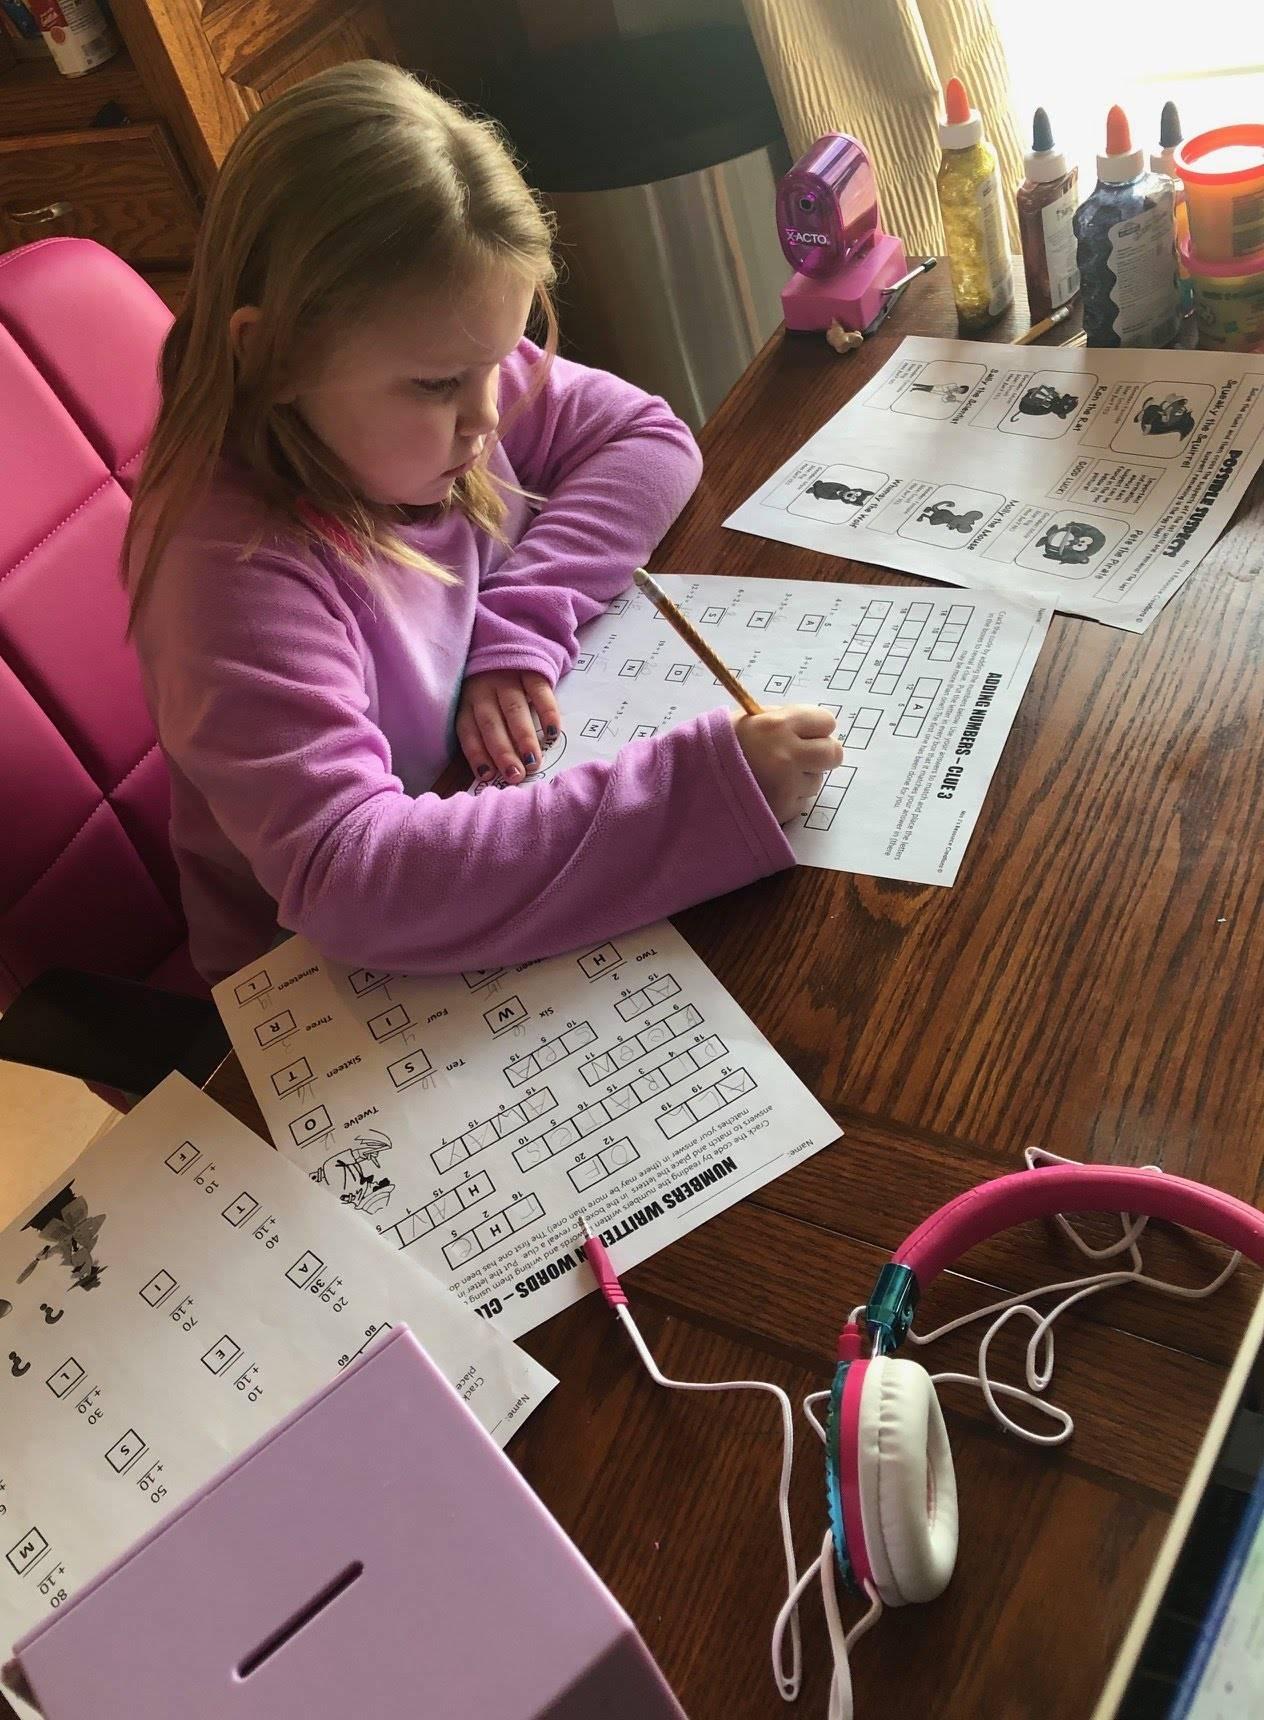 girl working on homework worksheet